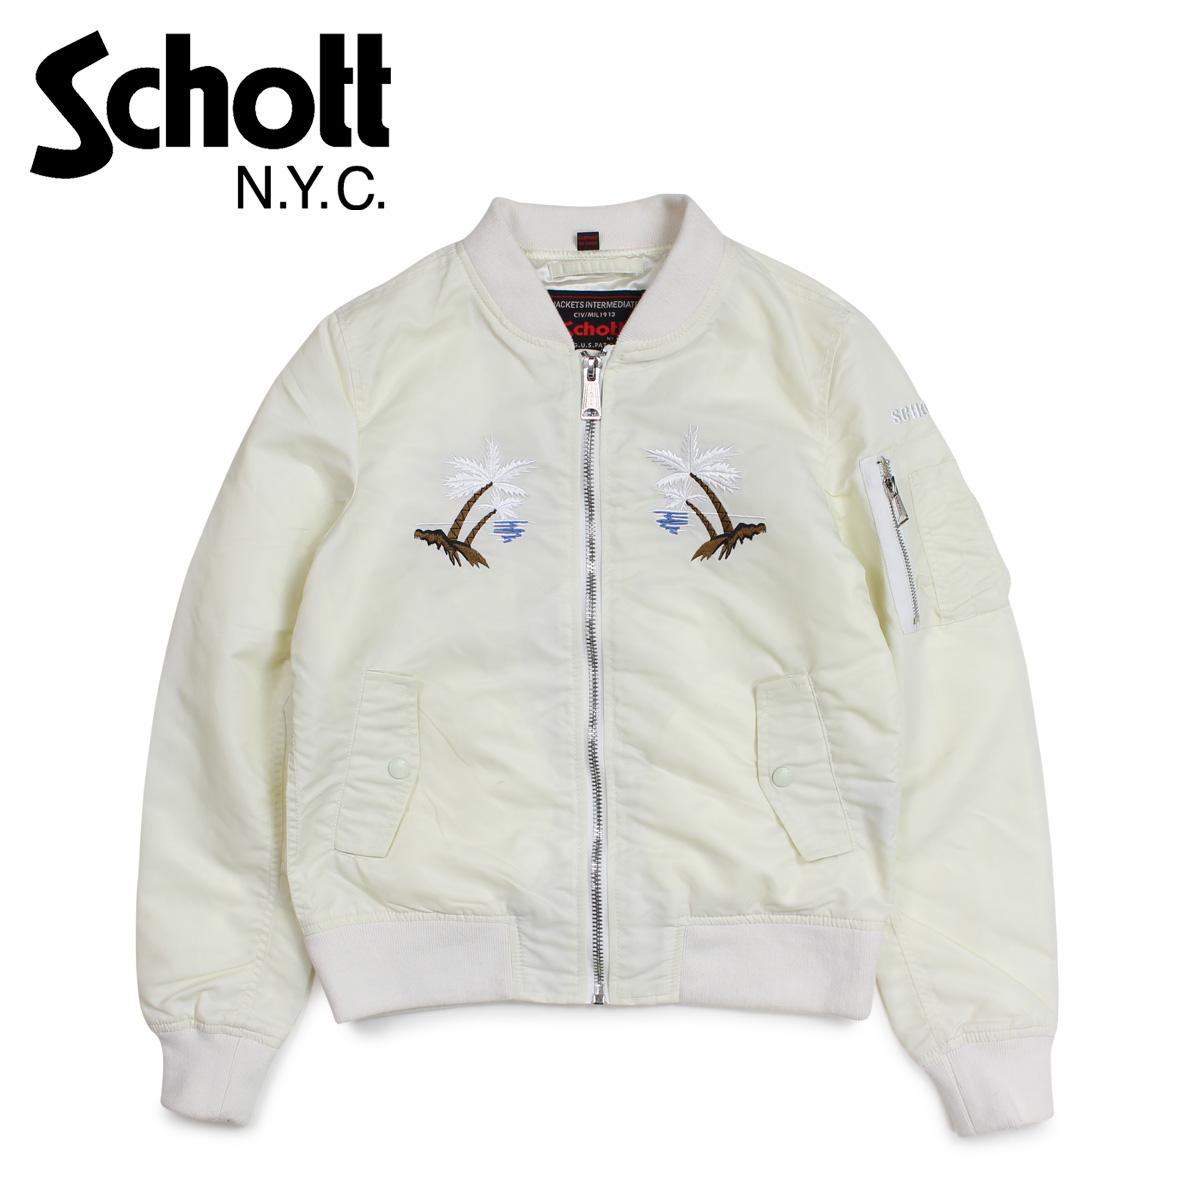 Schott ショット ジャケット フライトジャケット レディース WOMEN WAIKIKI COMMEMORATIVE FLIGHT JACKET ホワイト 9721W